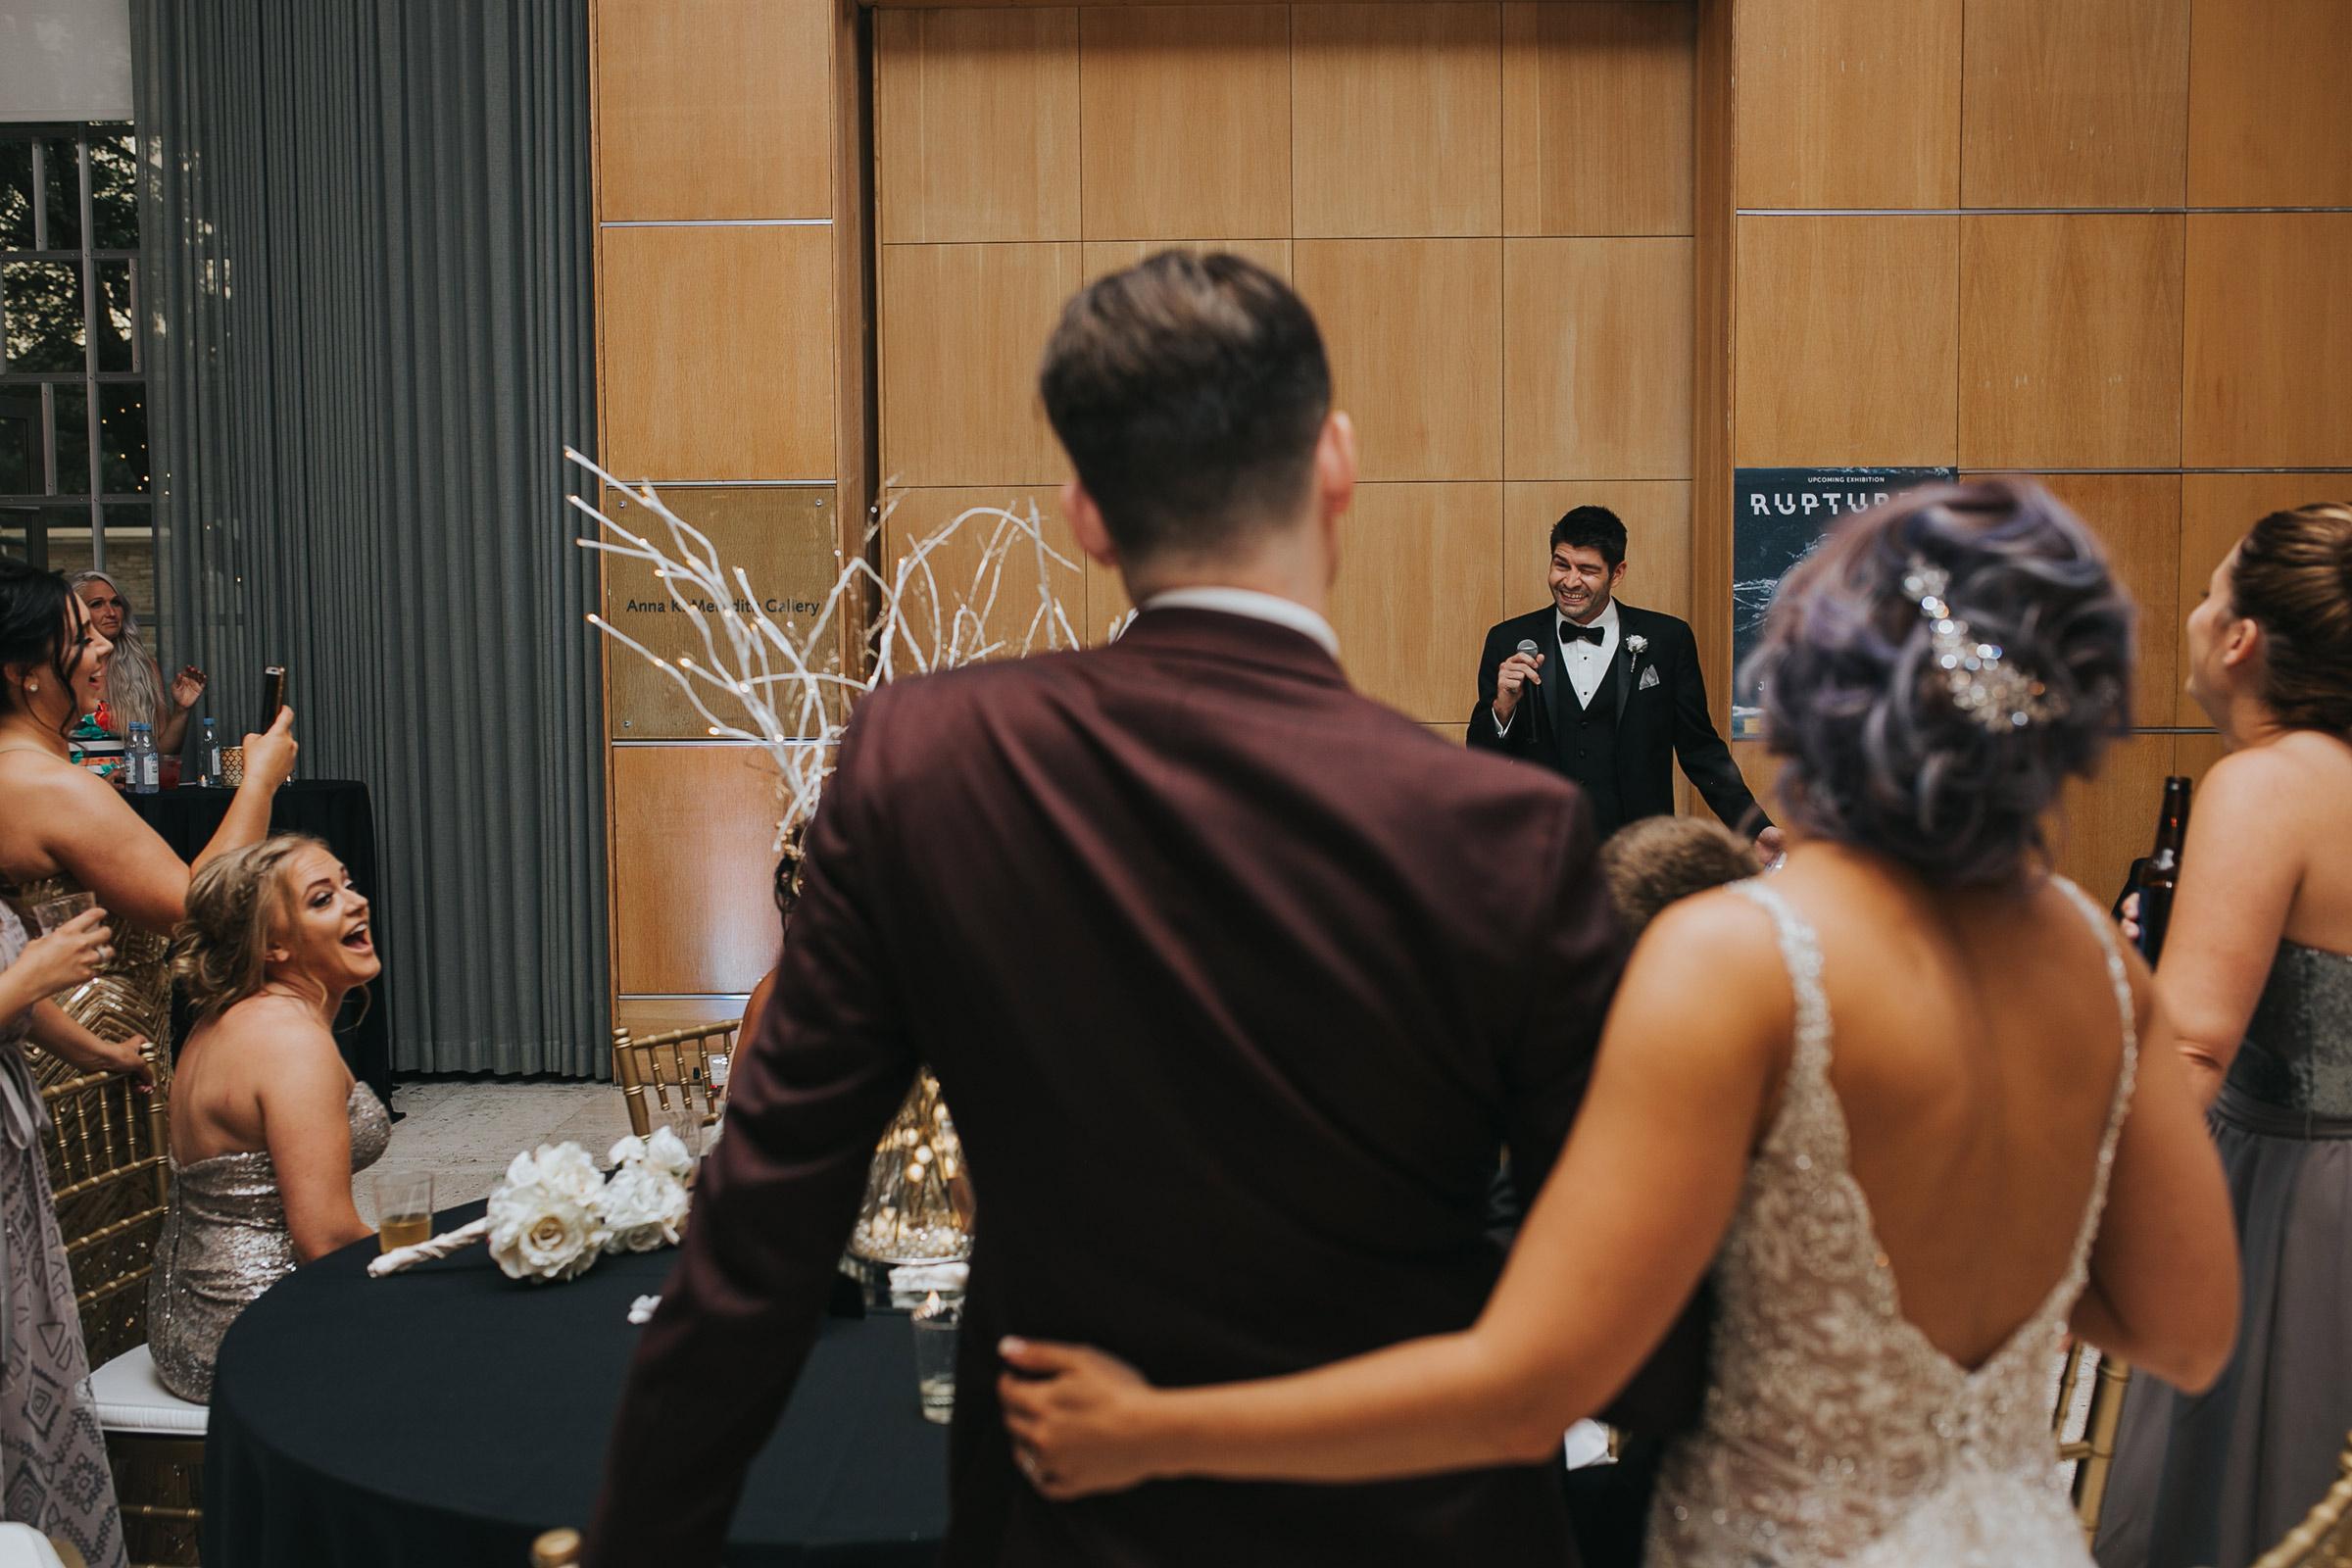 bride-groom-watching-best-man-make-speech-desmoines-iowa-art-center-raelyn-ramey-photography.jpg